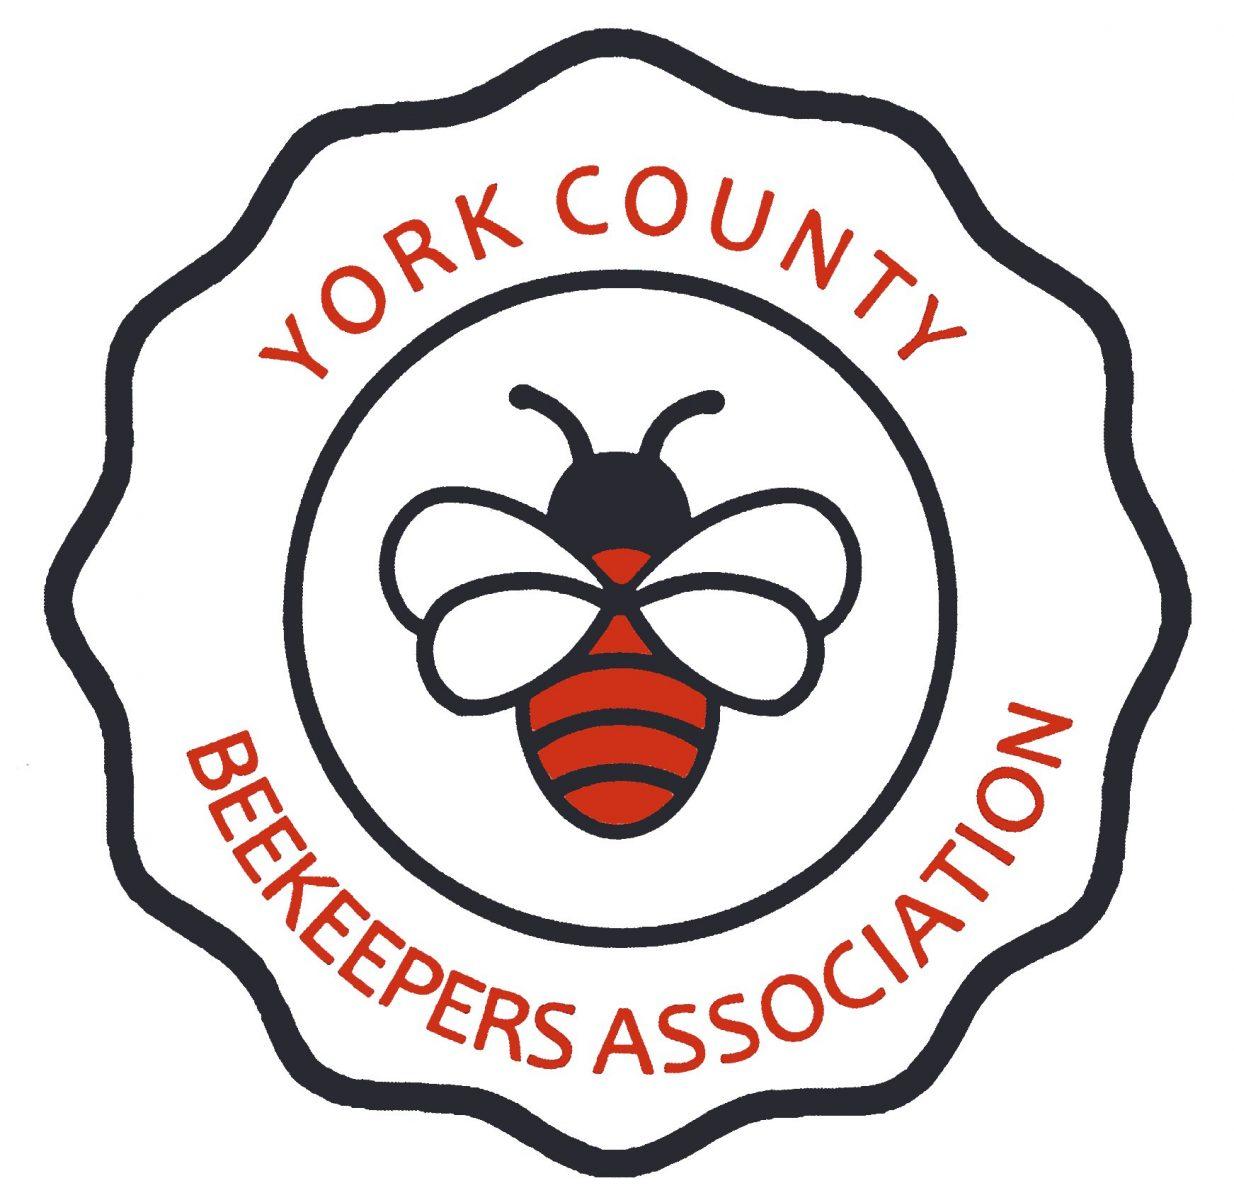 York County Beekeepers Association logo